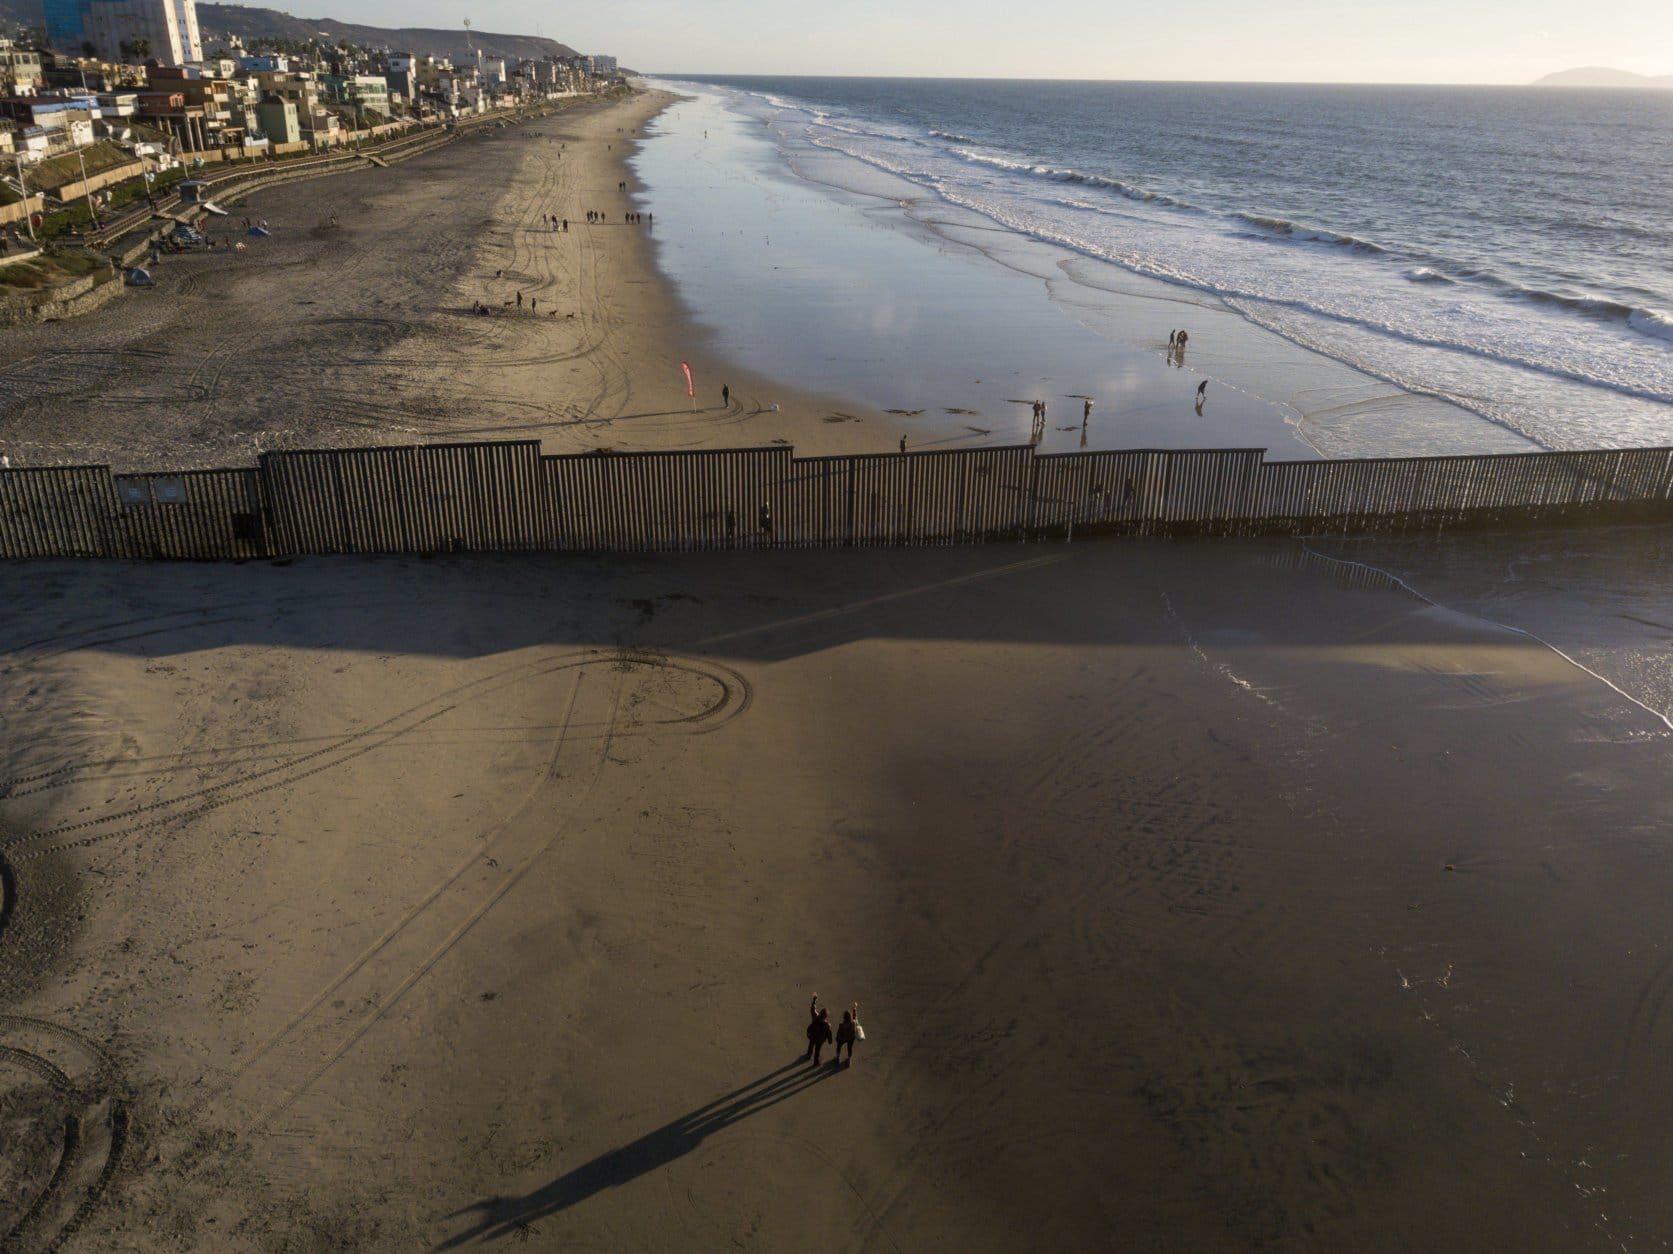 People on the U.S. side of the border wave at those on the Mexico side, at the border structure in San Diego on Nov. 23, 2018. (AP Photo/Rodrigo Abd)